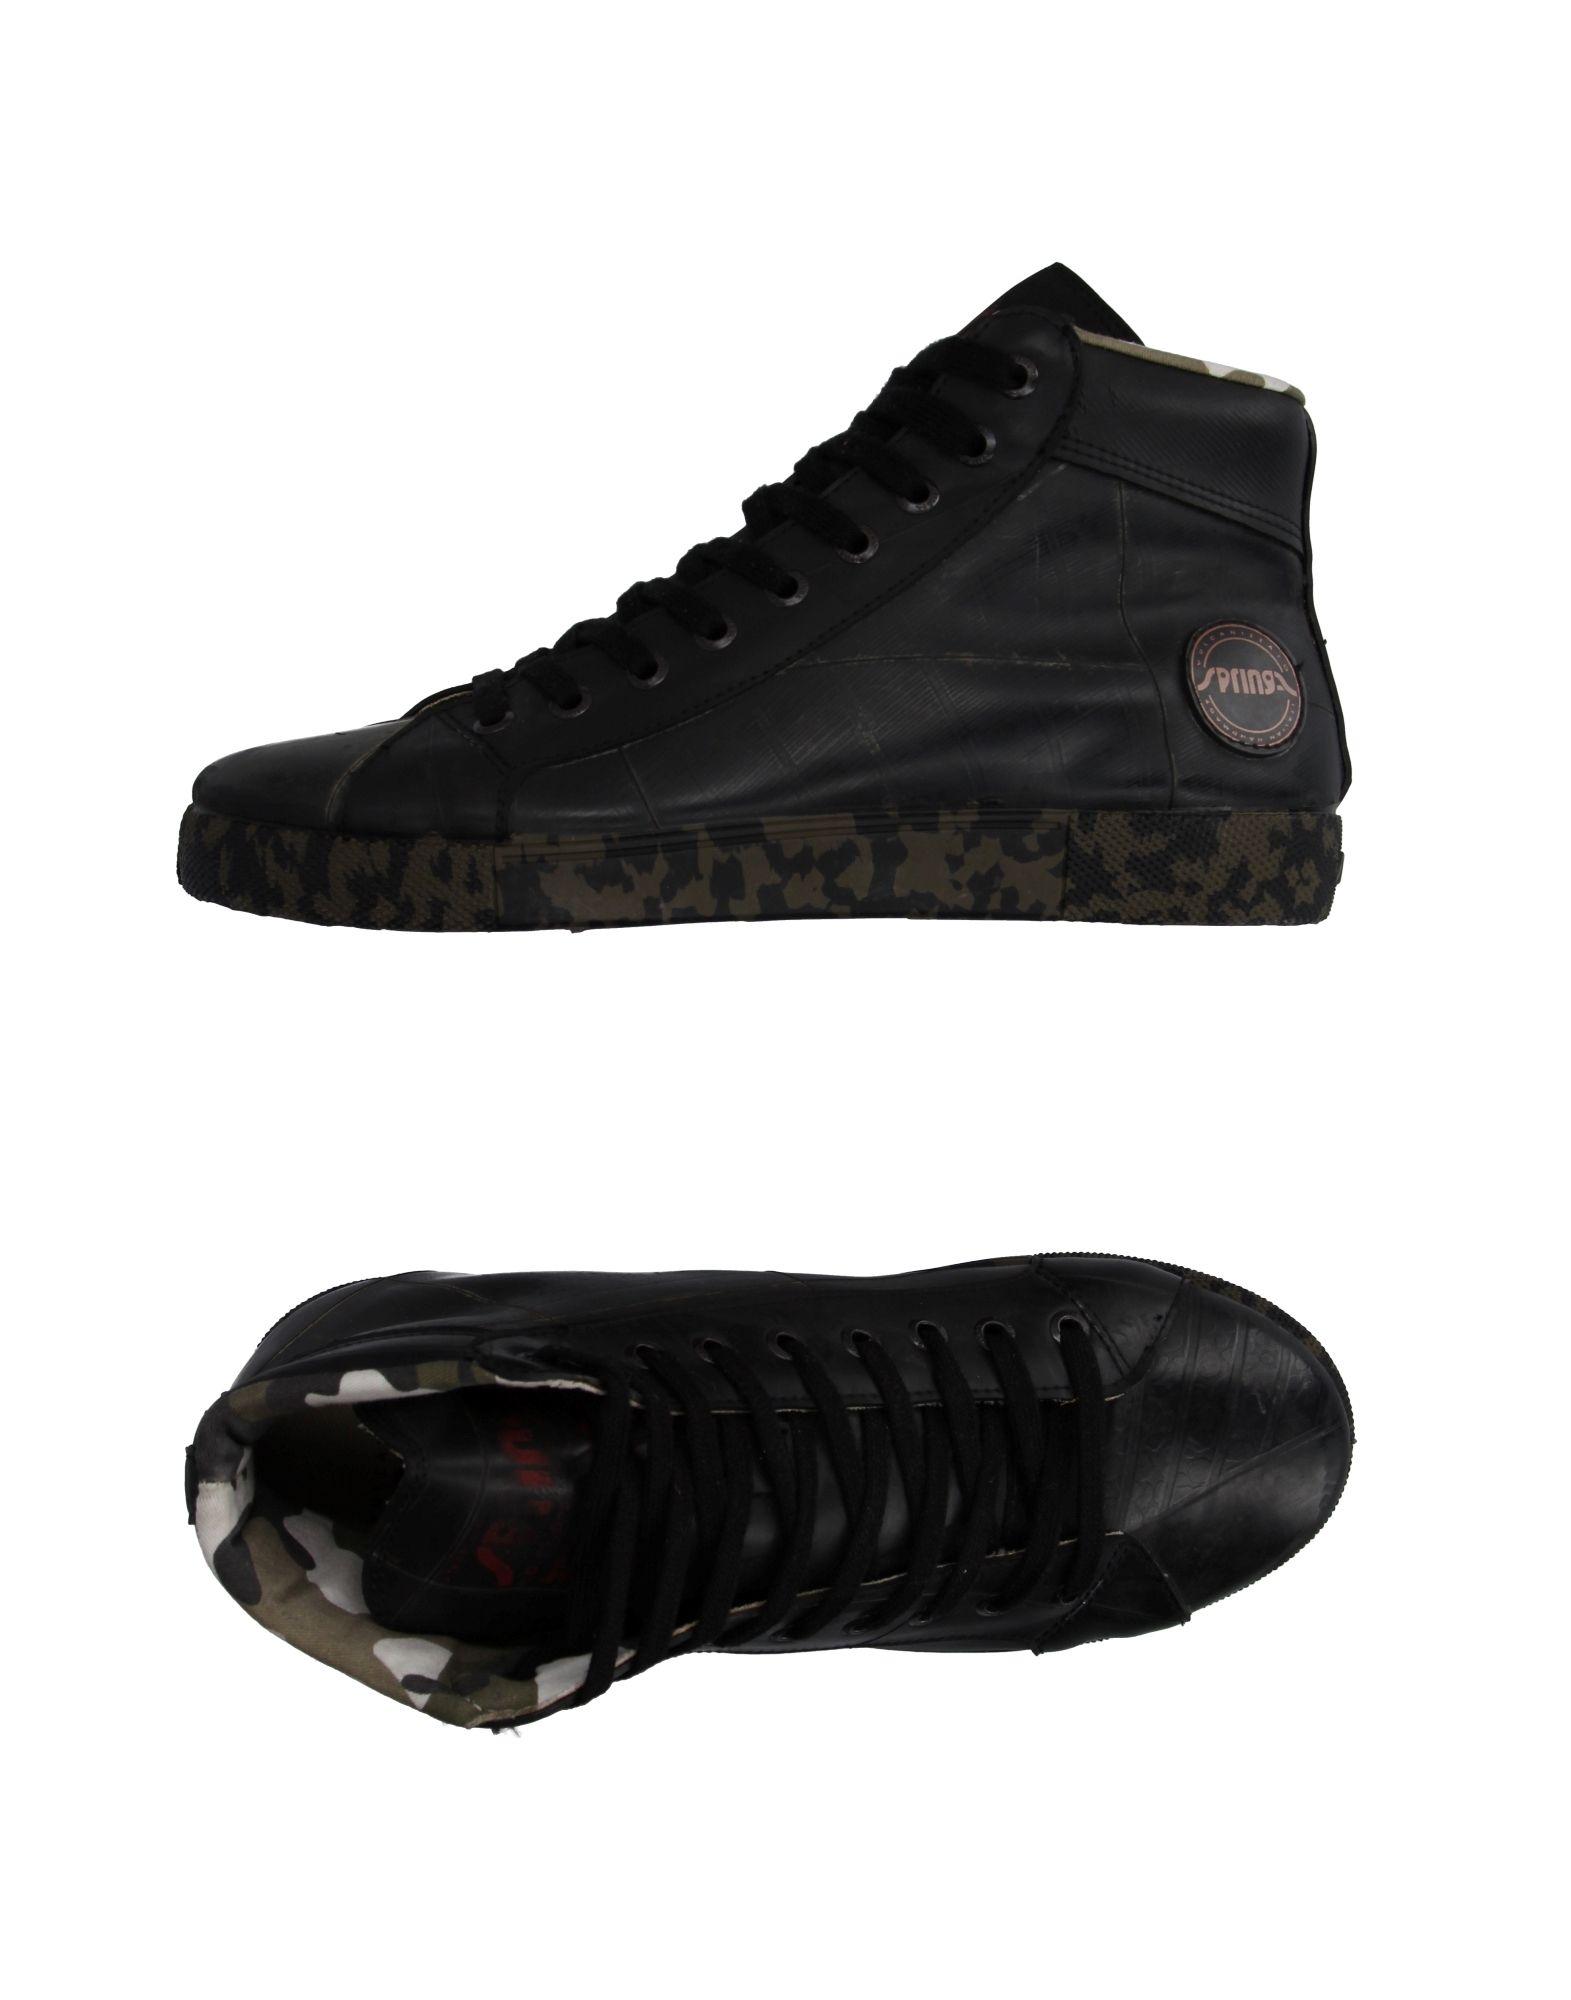 SPRINGA Высокие кеды и кроссовки кеды кроссовки высокие dc council mid tx stone camo